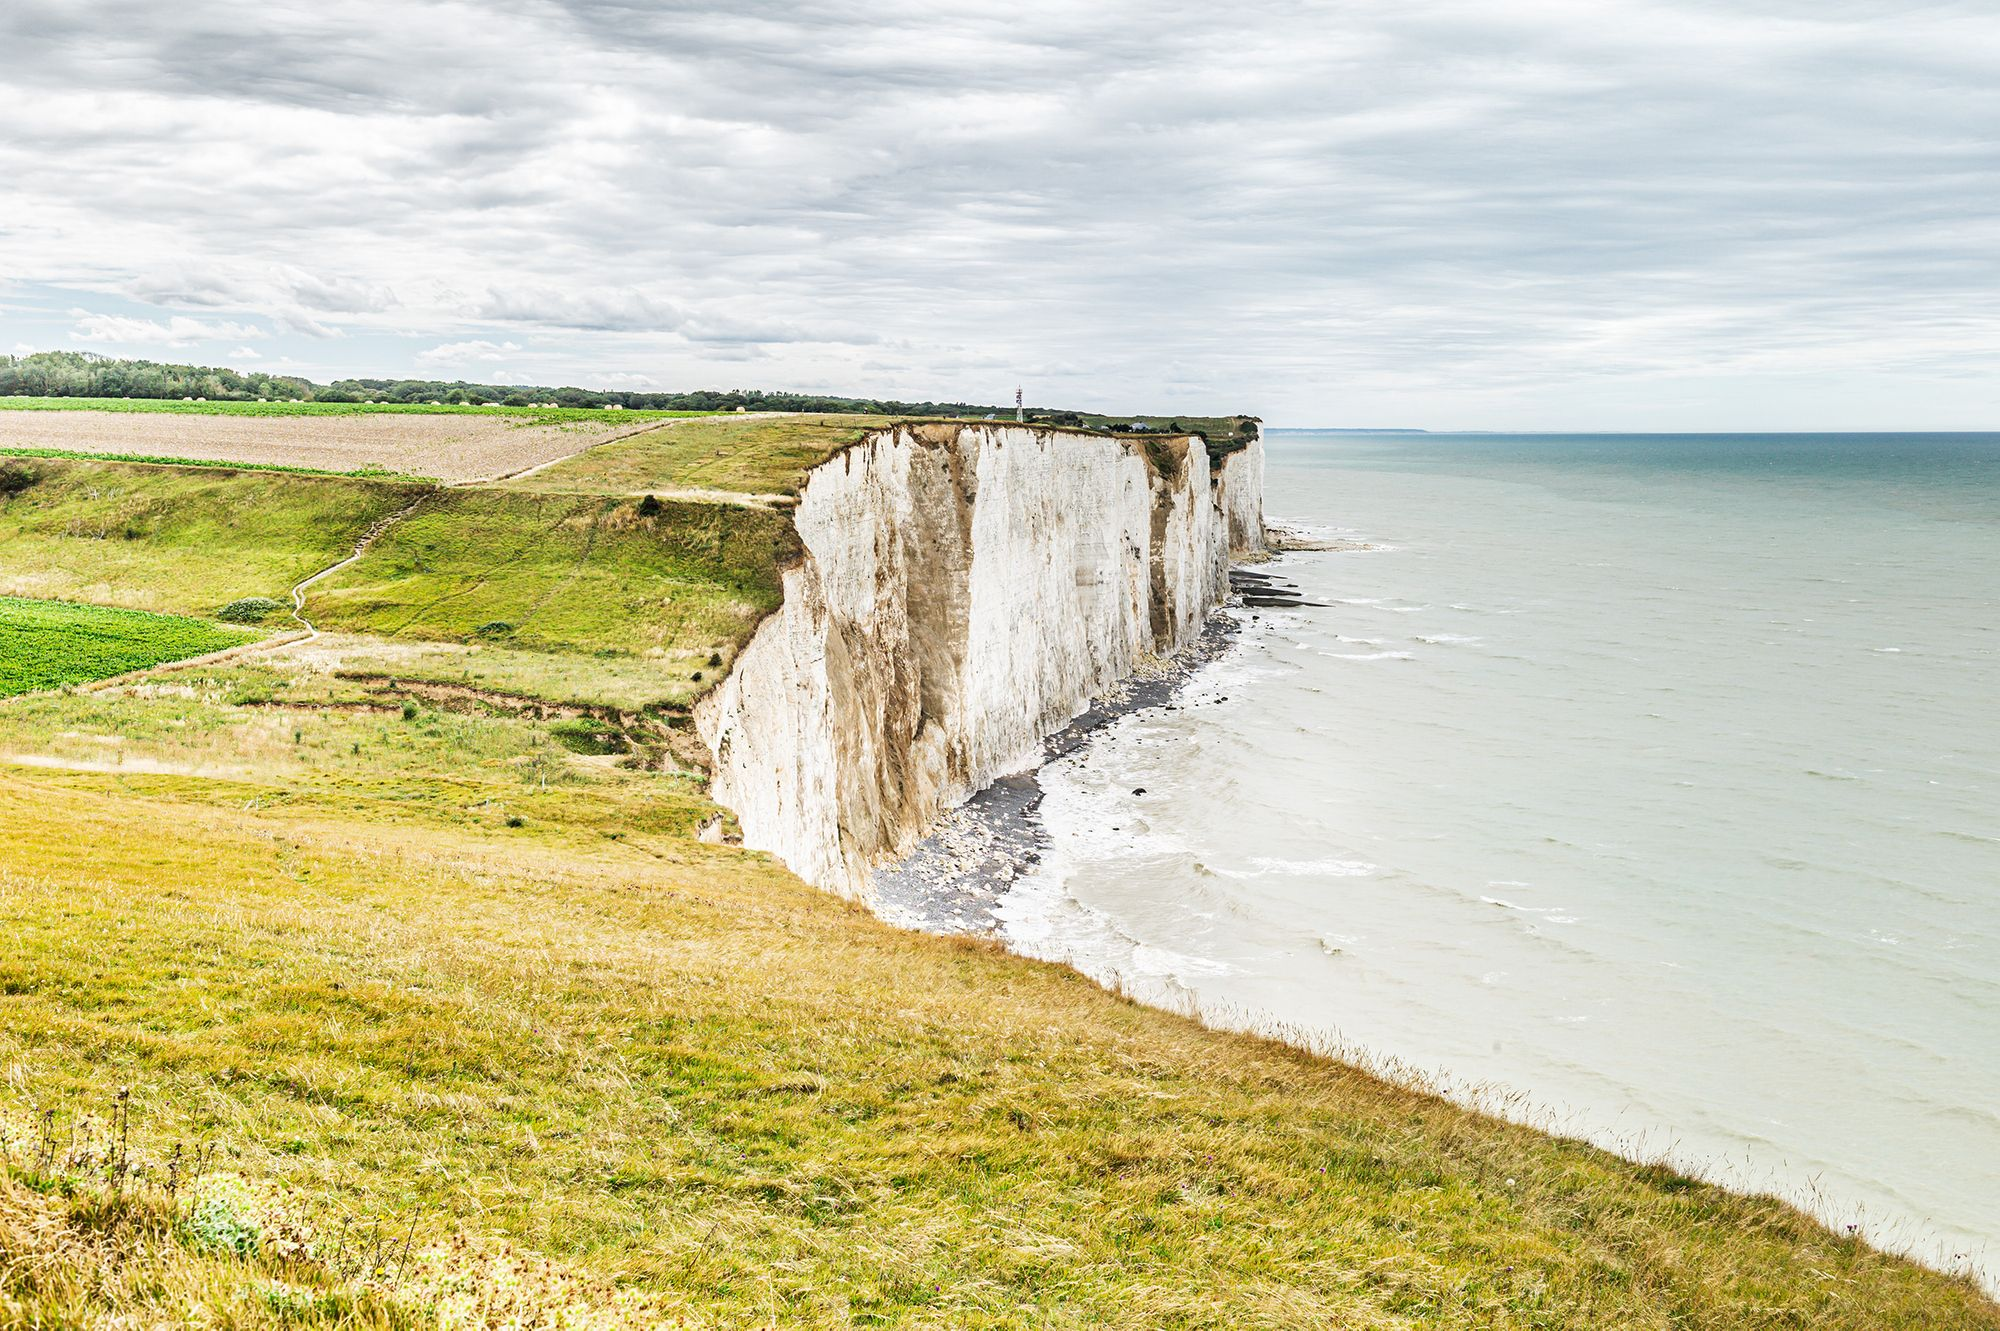 Normandy, France😎 #normandie #fotografie #fotograf #werbefotografie #visualartist #reisen #leica #leicaphotography